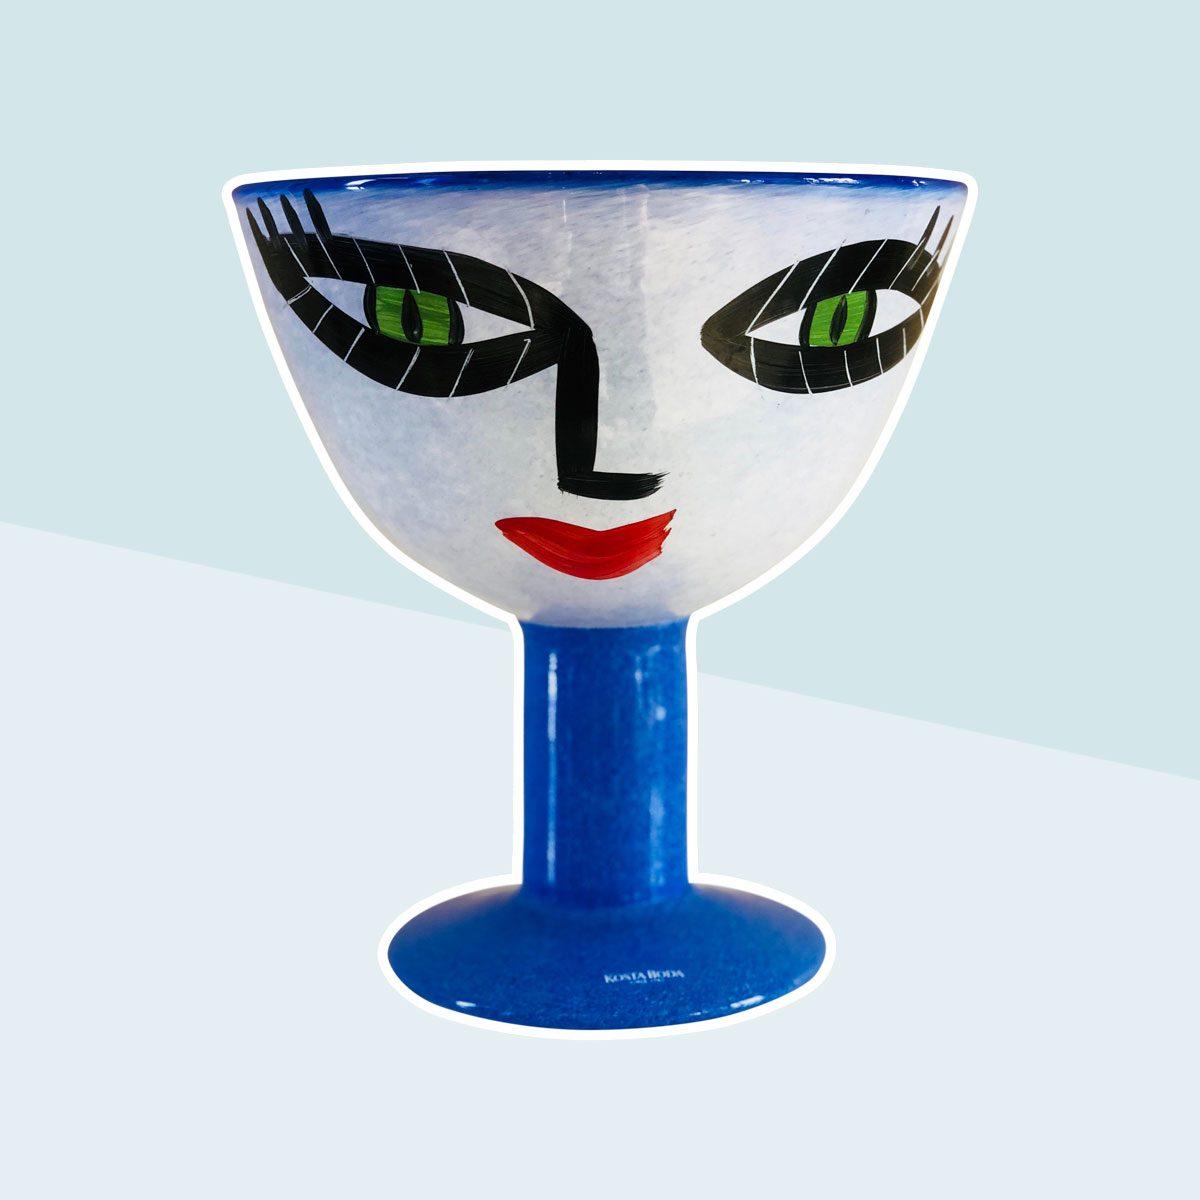 Ulrica Hydman-Vallien Kosta Boda Hand-Painted Face Vase